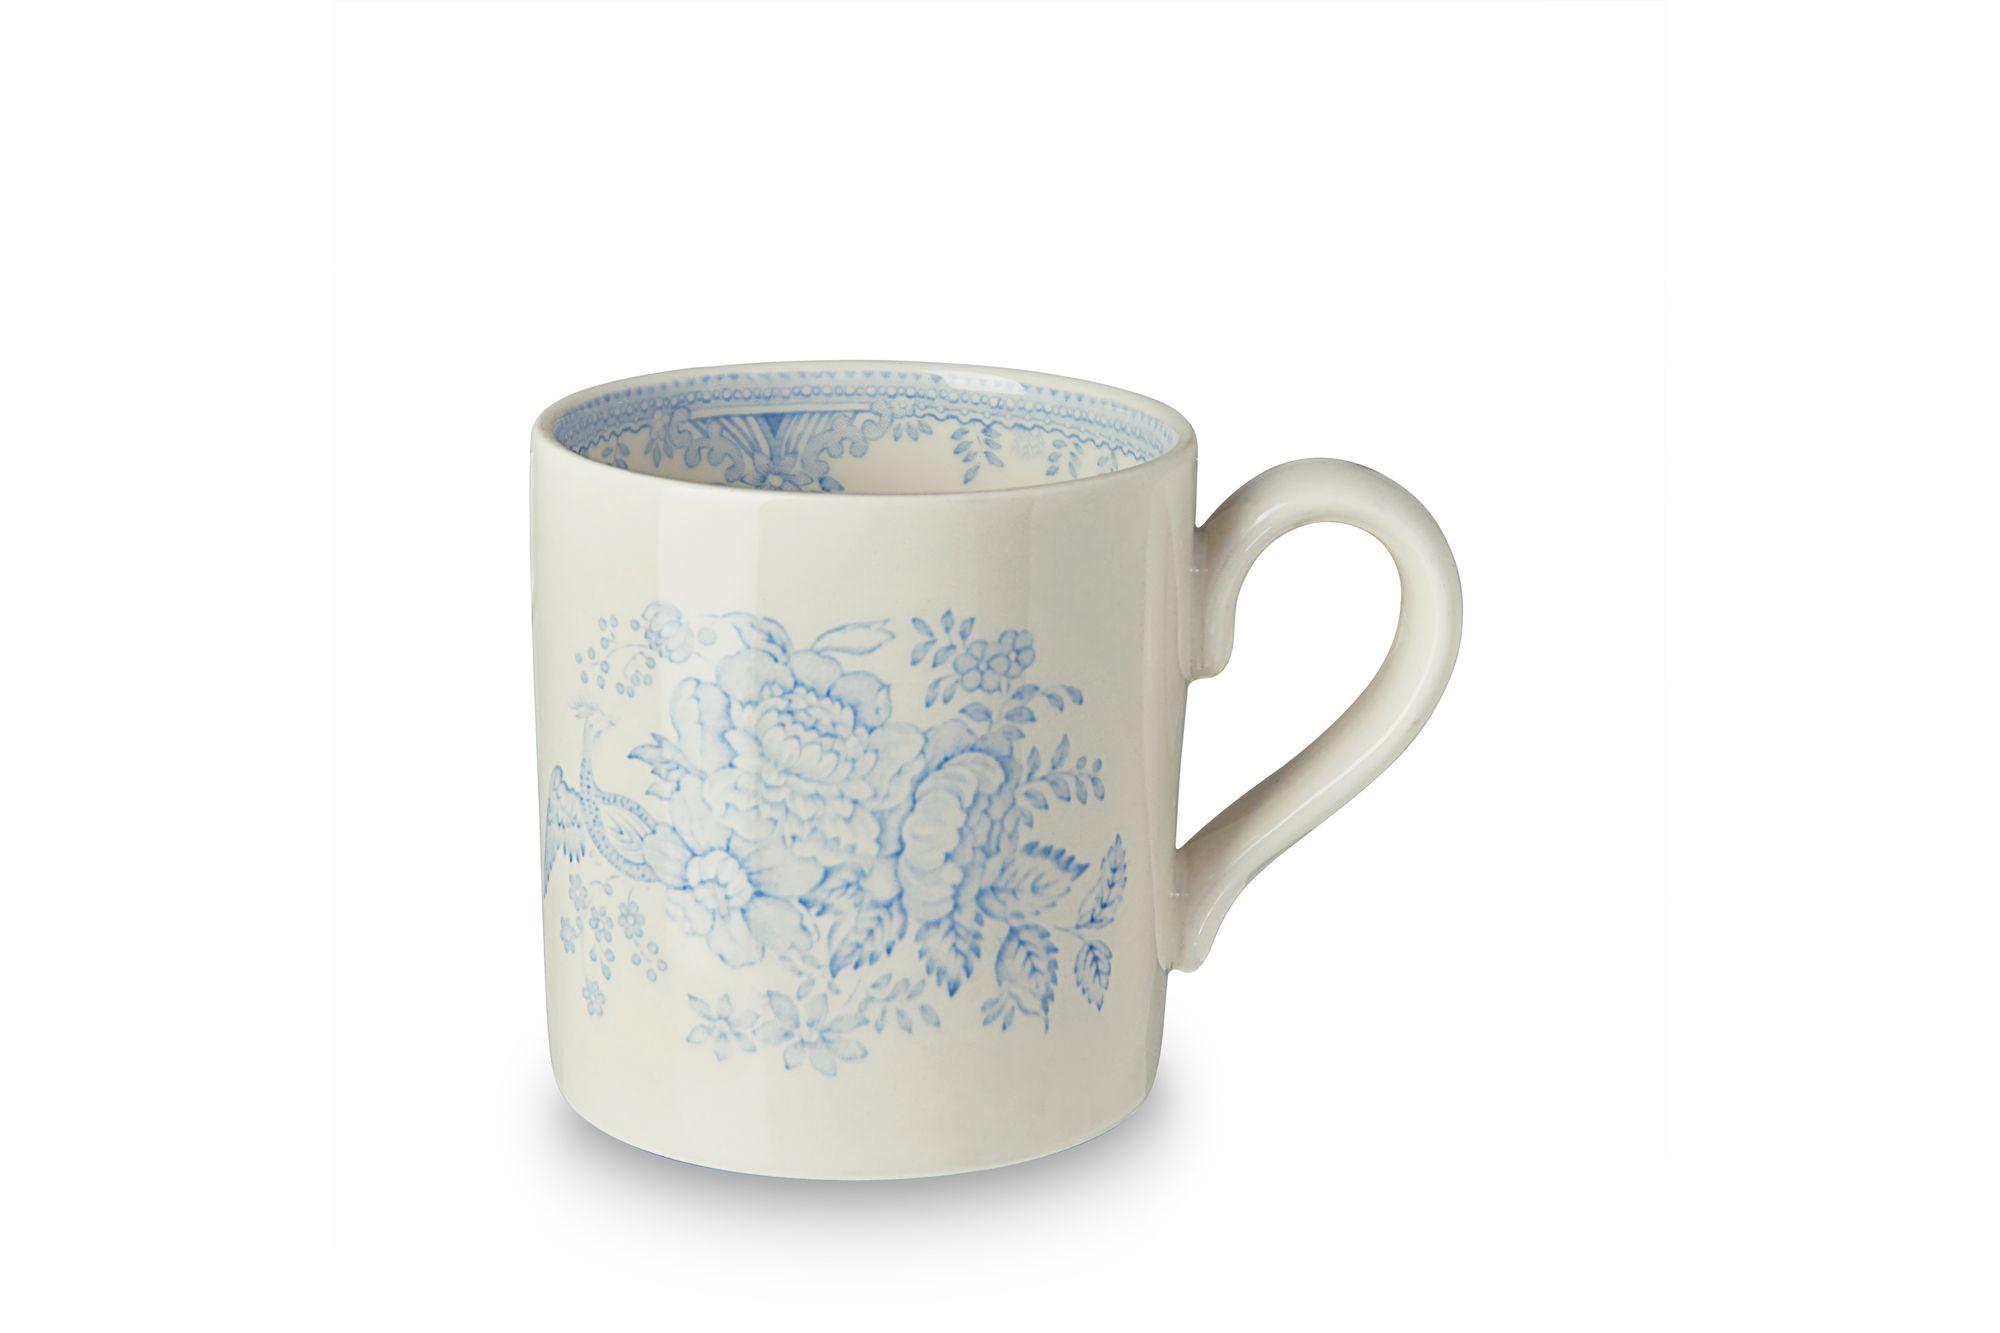 "Burleigh Blue Asiatic Pheasants Mug 3 1/2 x 3 1/2"" thumb 1"